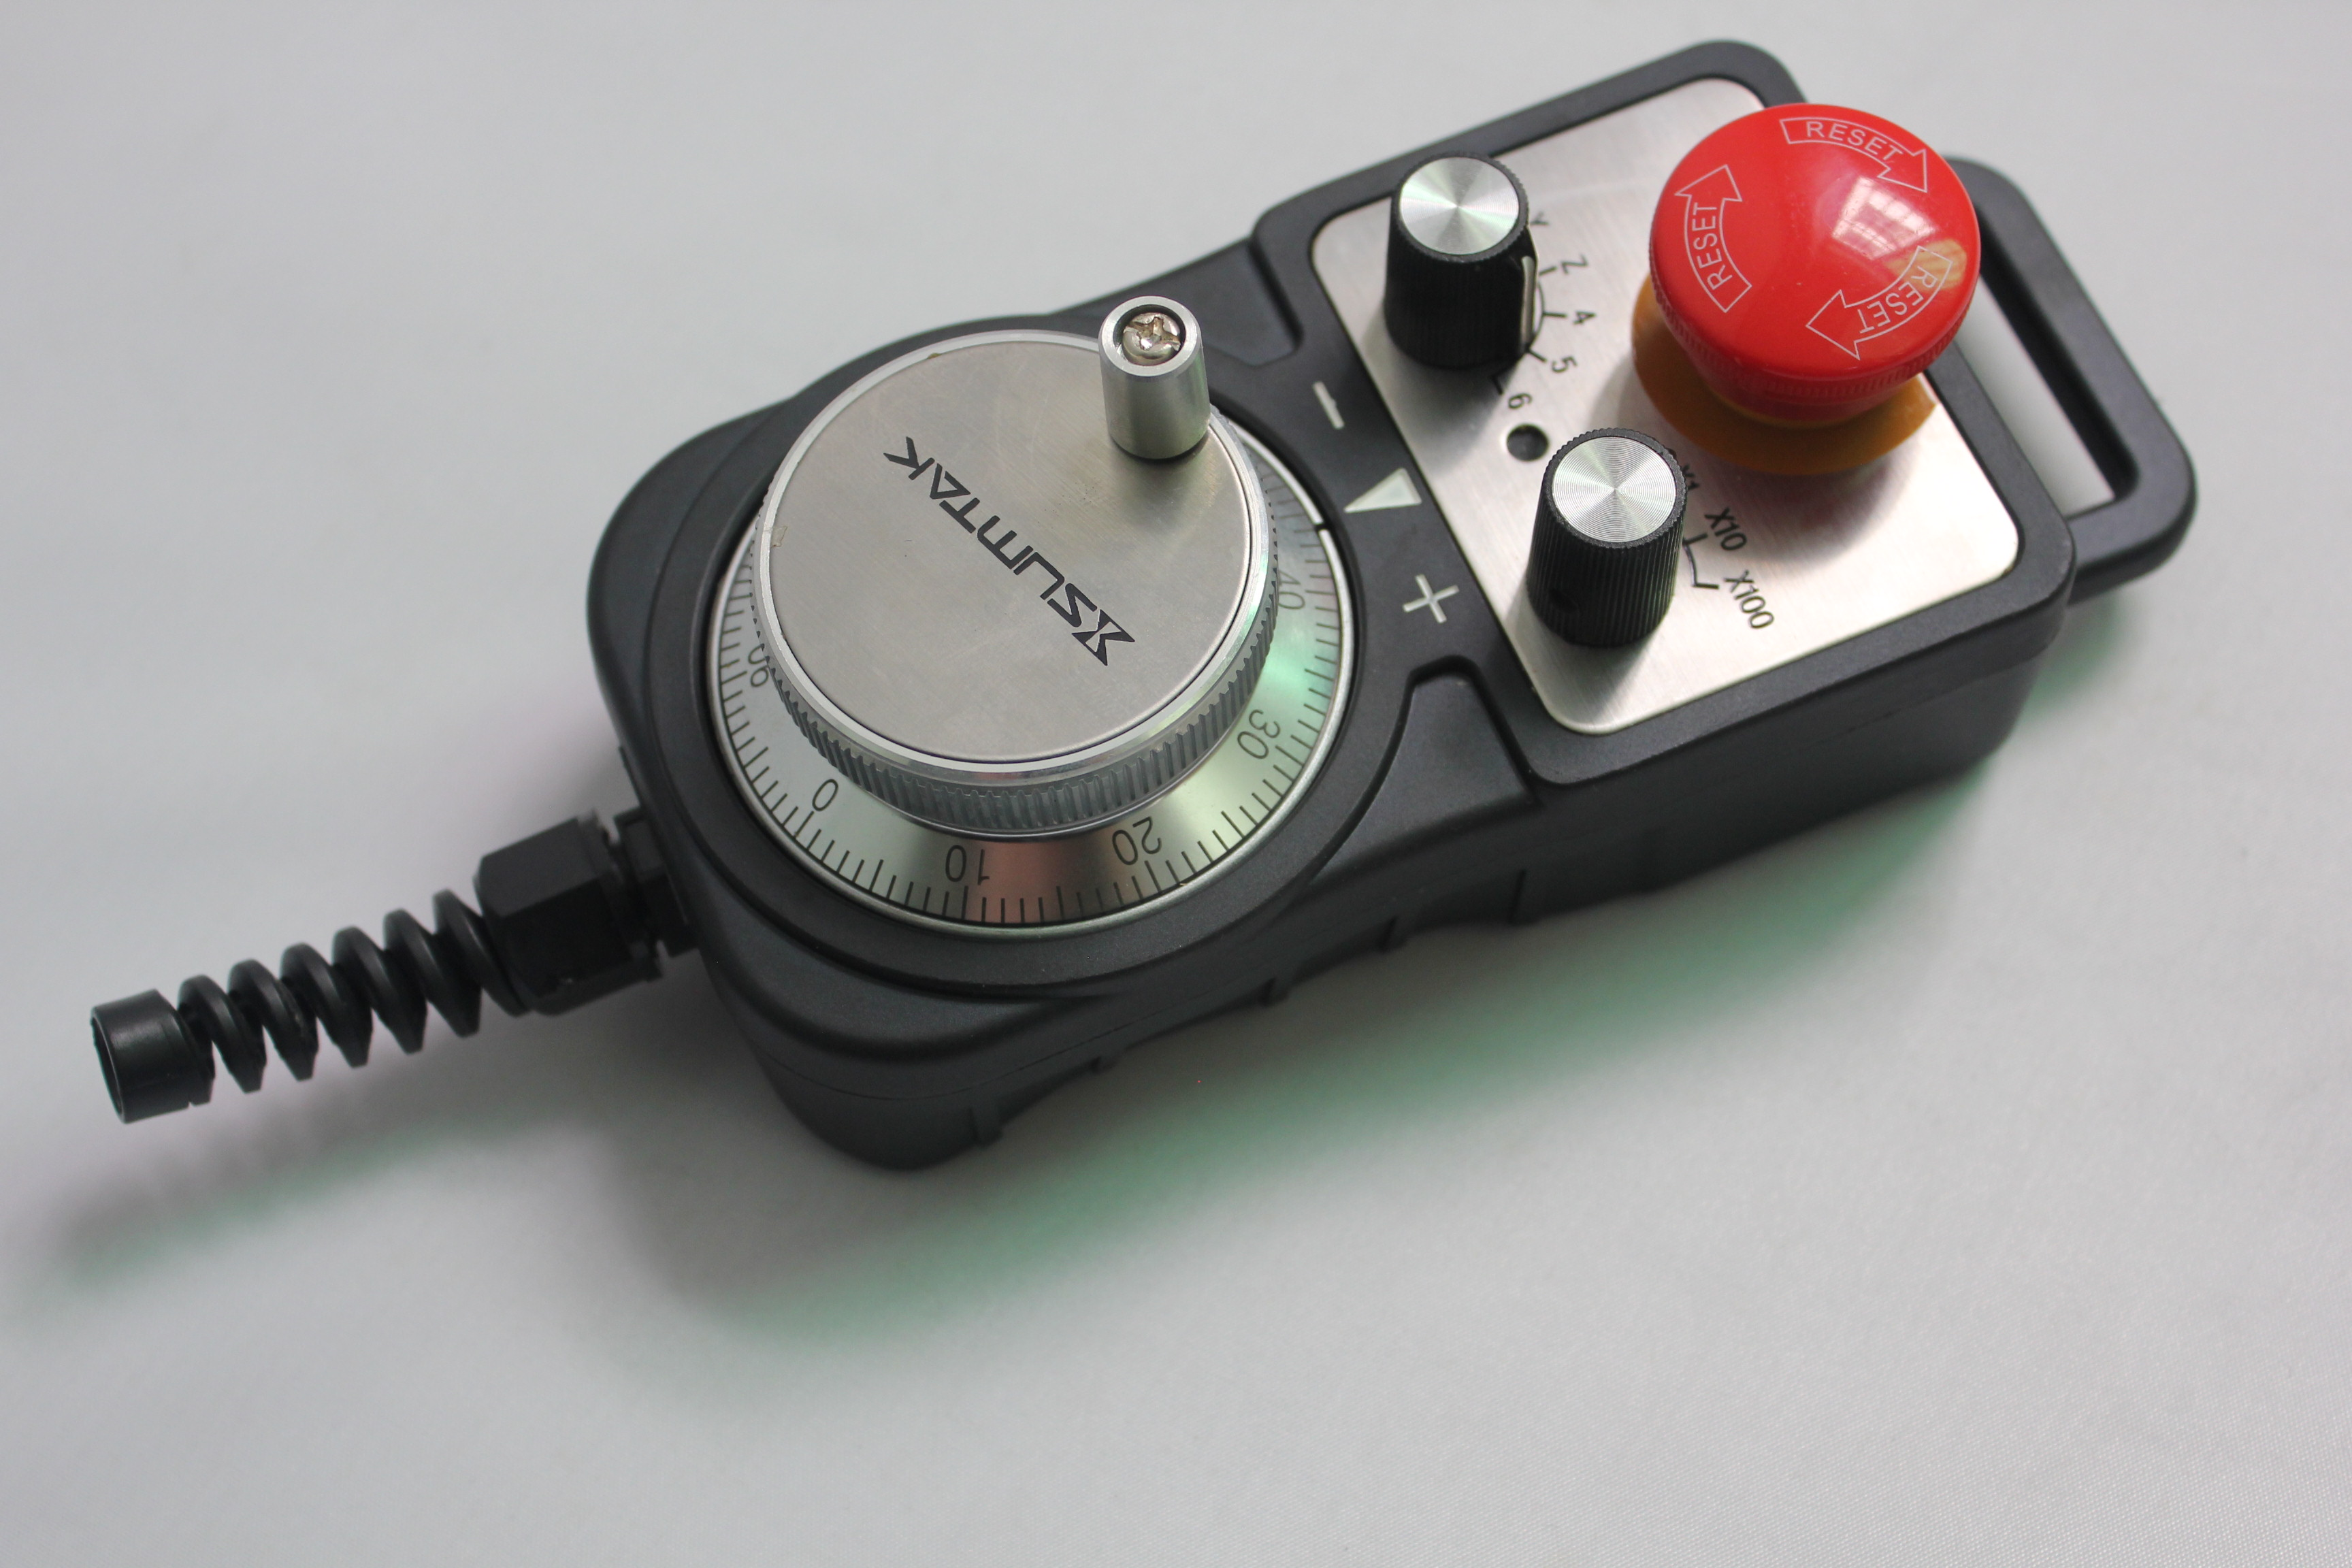 DAG数控机床加工中心精雕机通用型电子手轮脉冲发生器PT带急停功能